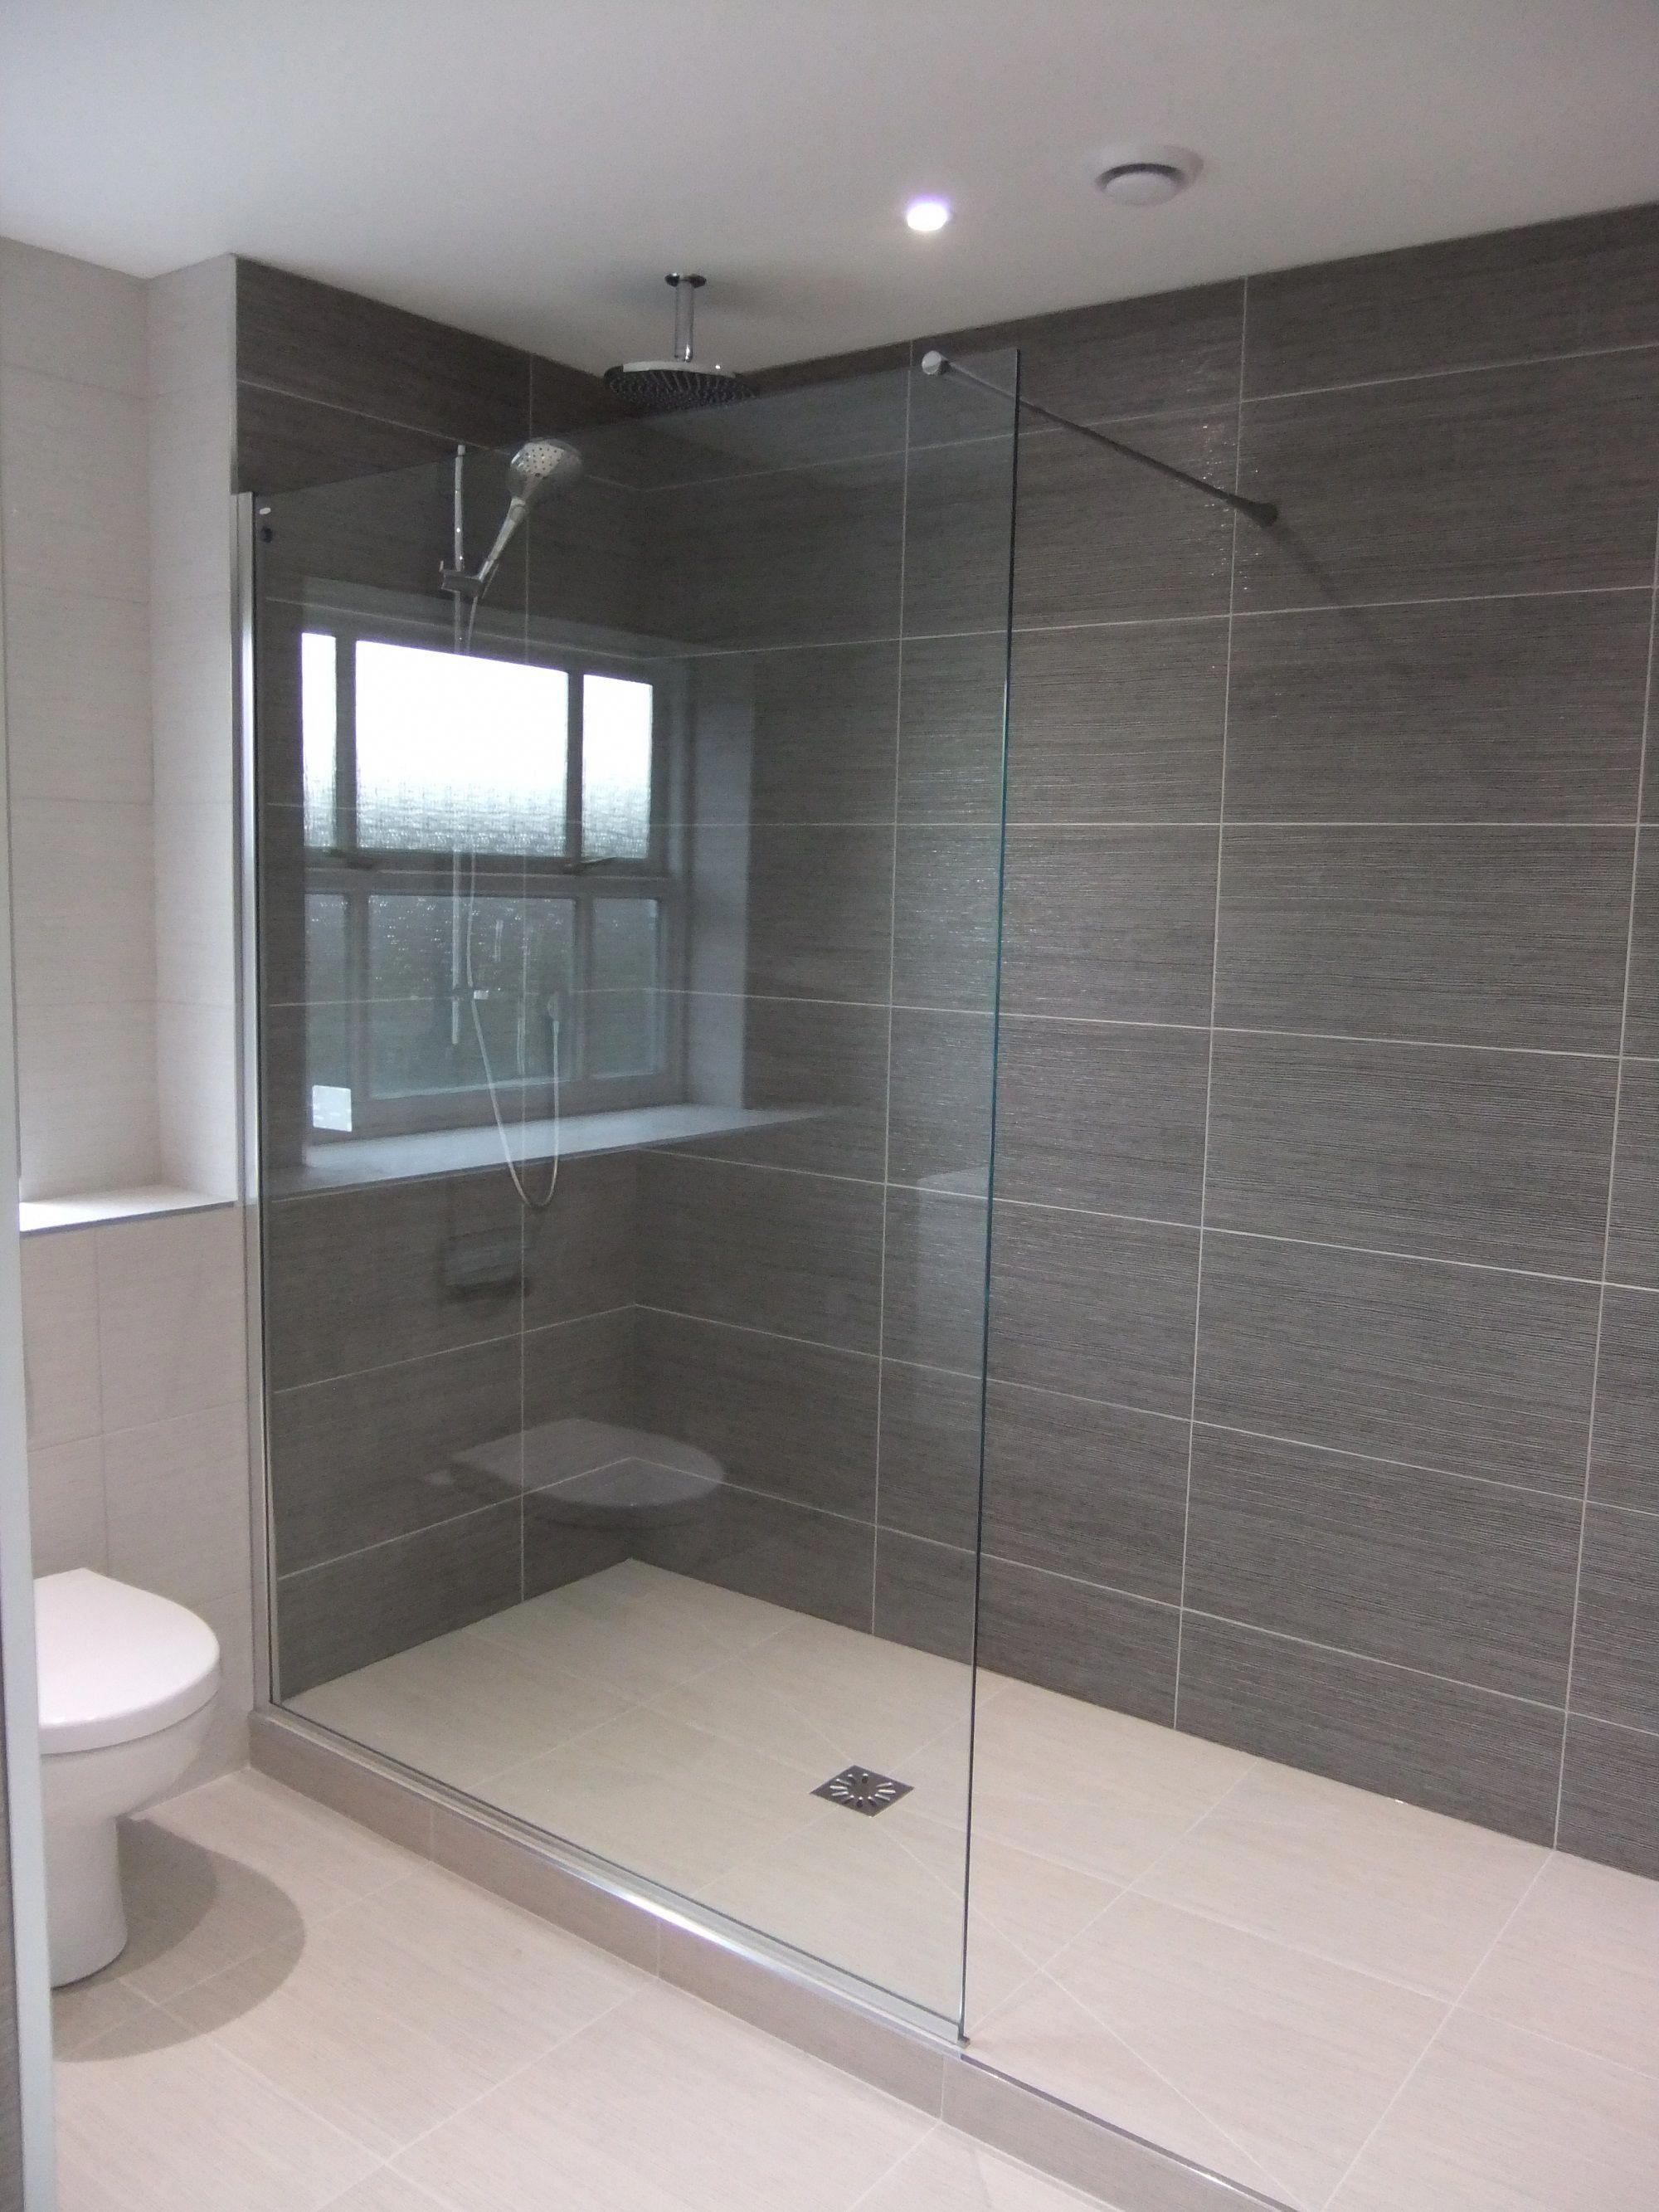 Glass Panel Holder Bathroomshowernew Bathroom Remodel Shower Bathroom Design Bathroom Interior